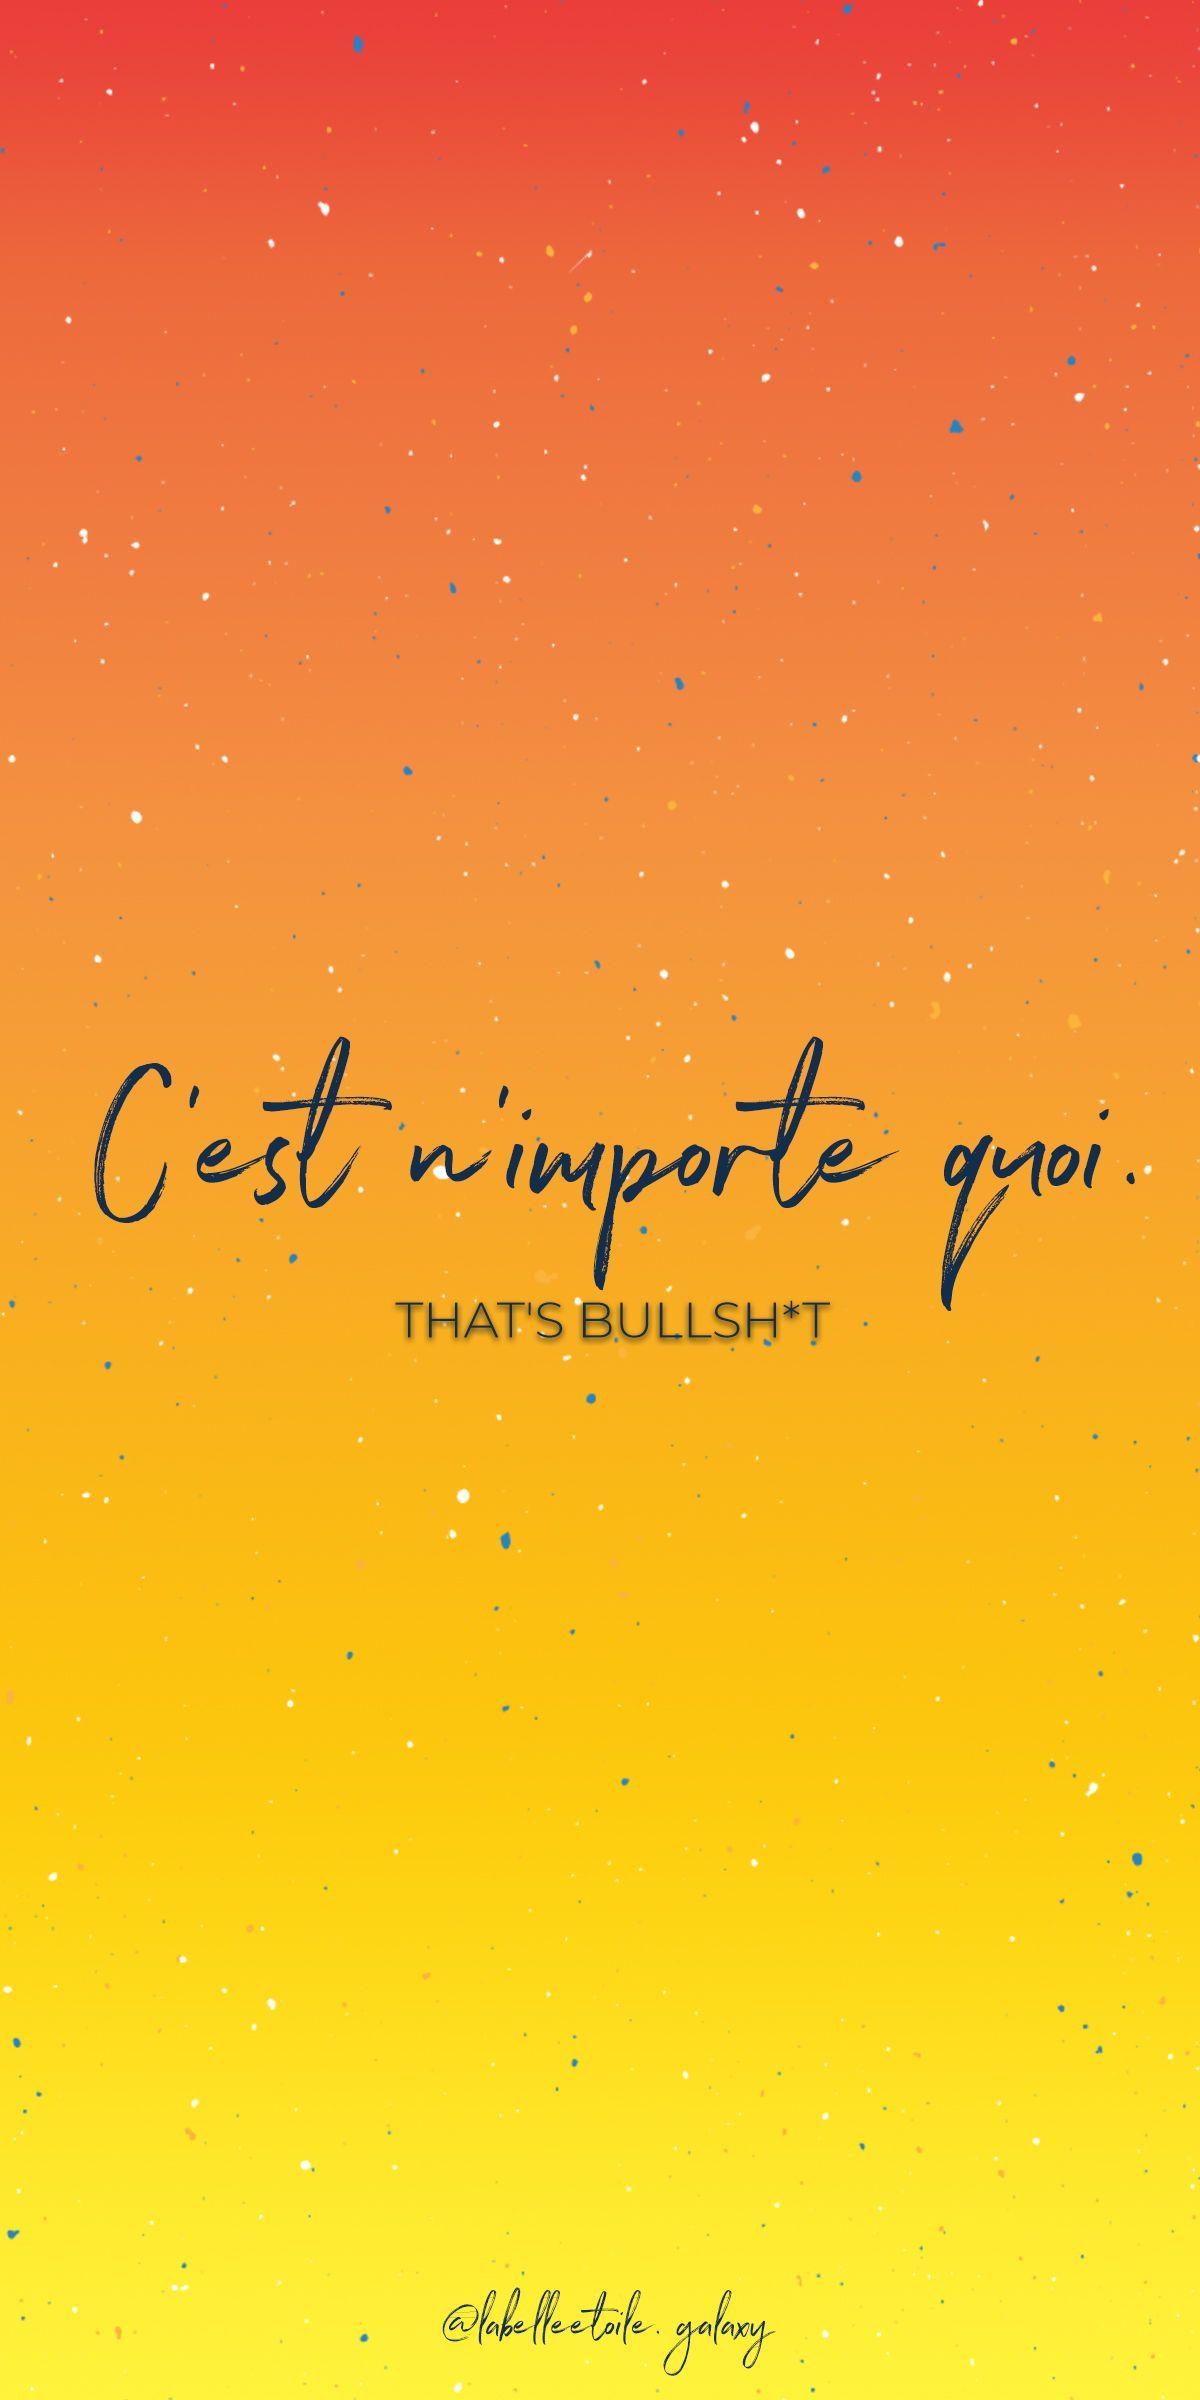 C Est N Importe Quoi : importe, C'est, N'importe, That's, Bullsh*t, Bonjour, Right, Learn, French, Quotes,, Words…, Wallpaper,, Phrases,